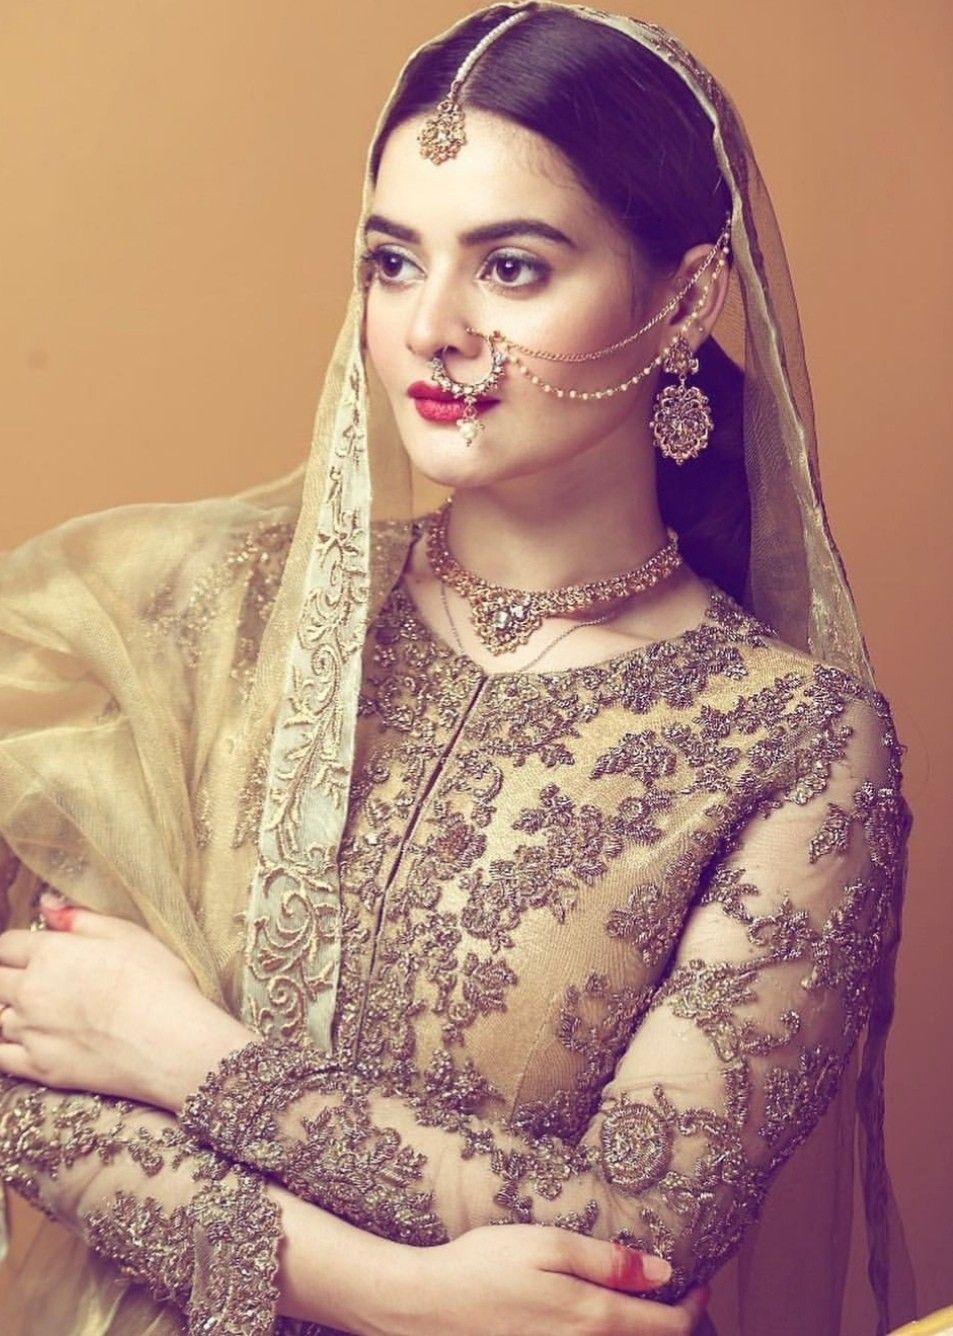 Pin by Saira Imran on Women clothing Pakistani wedding